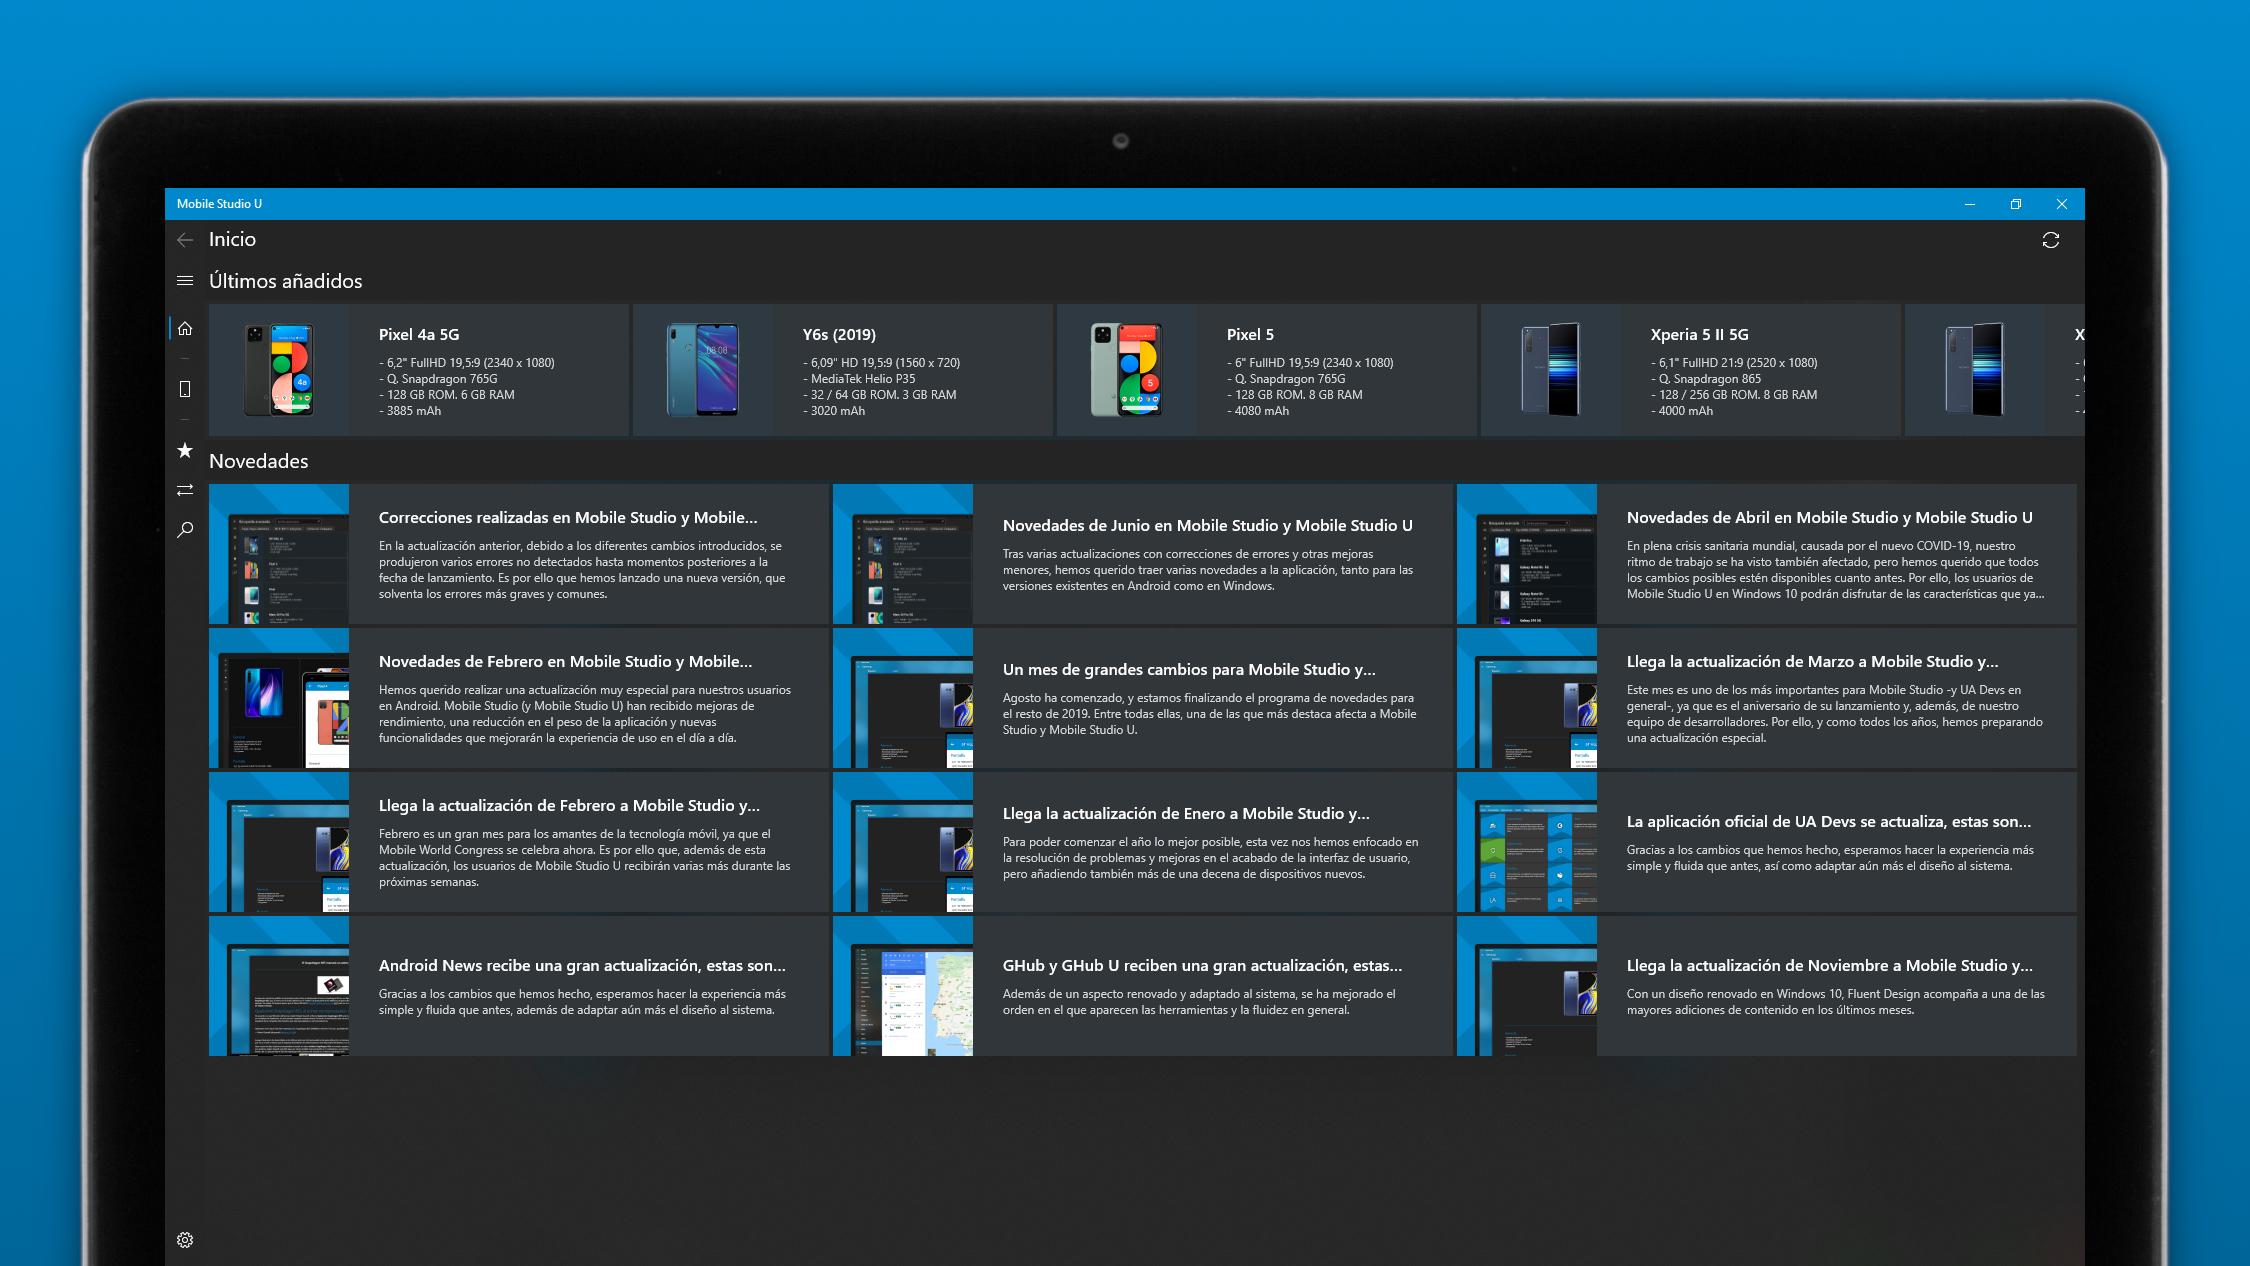 https://uares.blob.core.windows.net/app-mobilestudio/MobileStudio_PC_ES_1.png